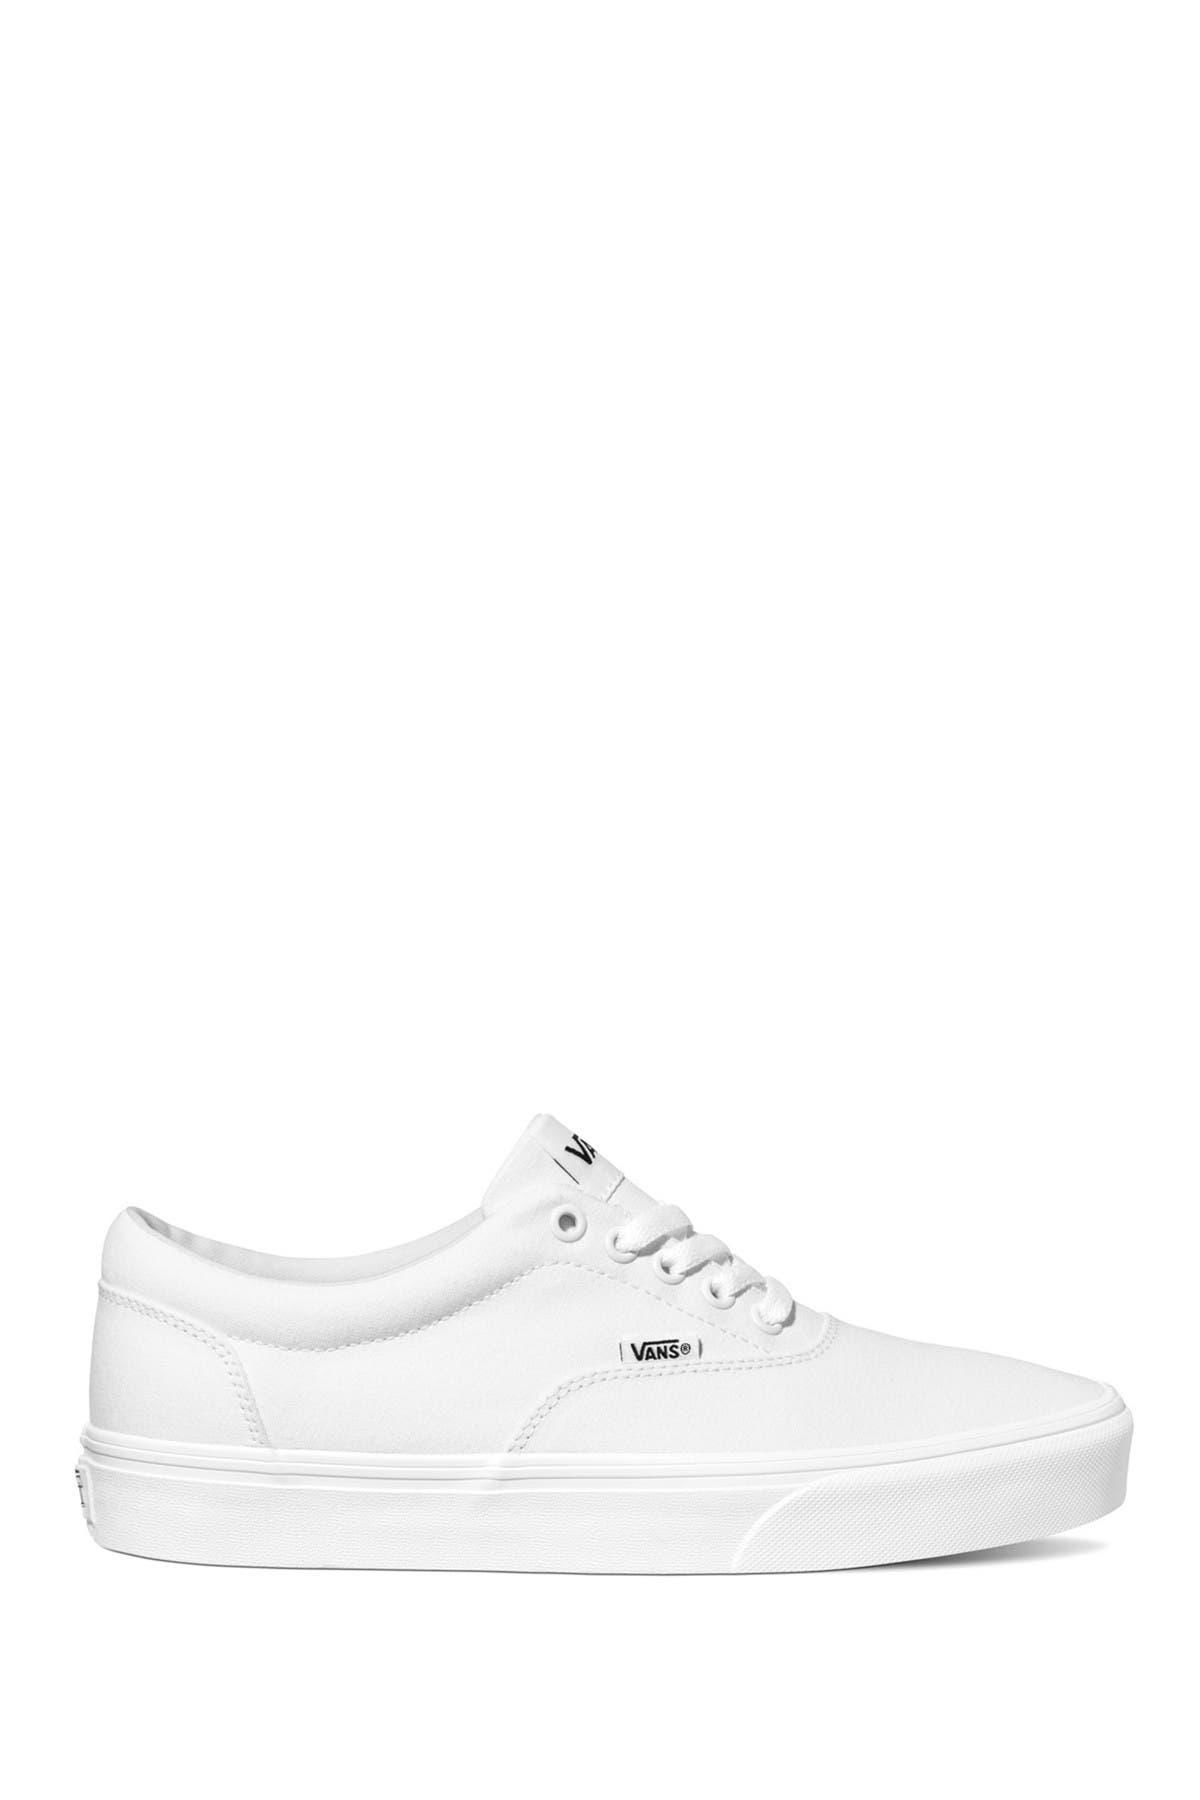 vans triple white